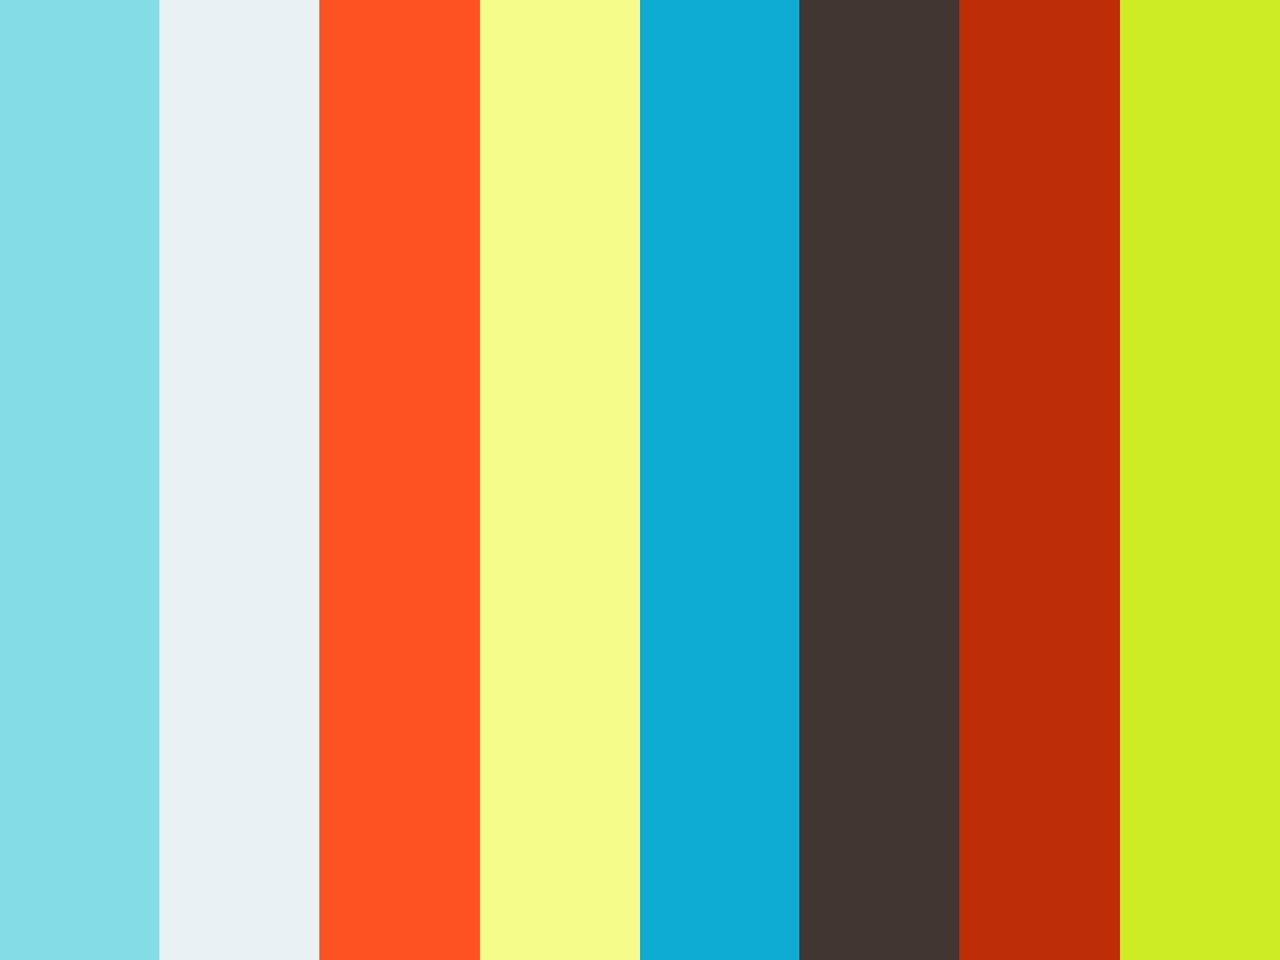 Molokai Covid19 Update - Tuesday, April 7, 2020